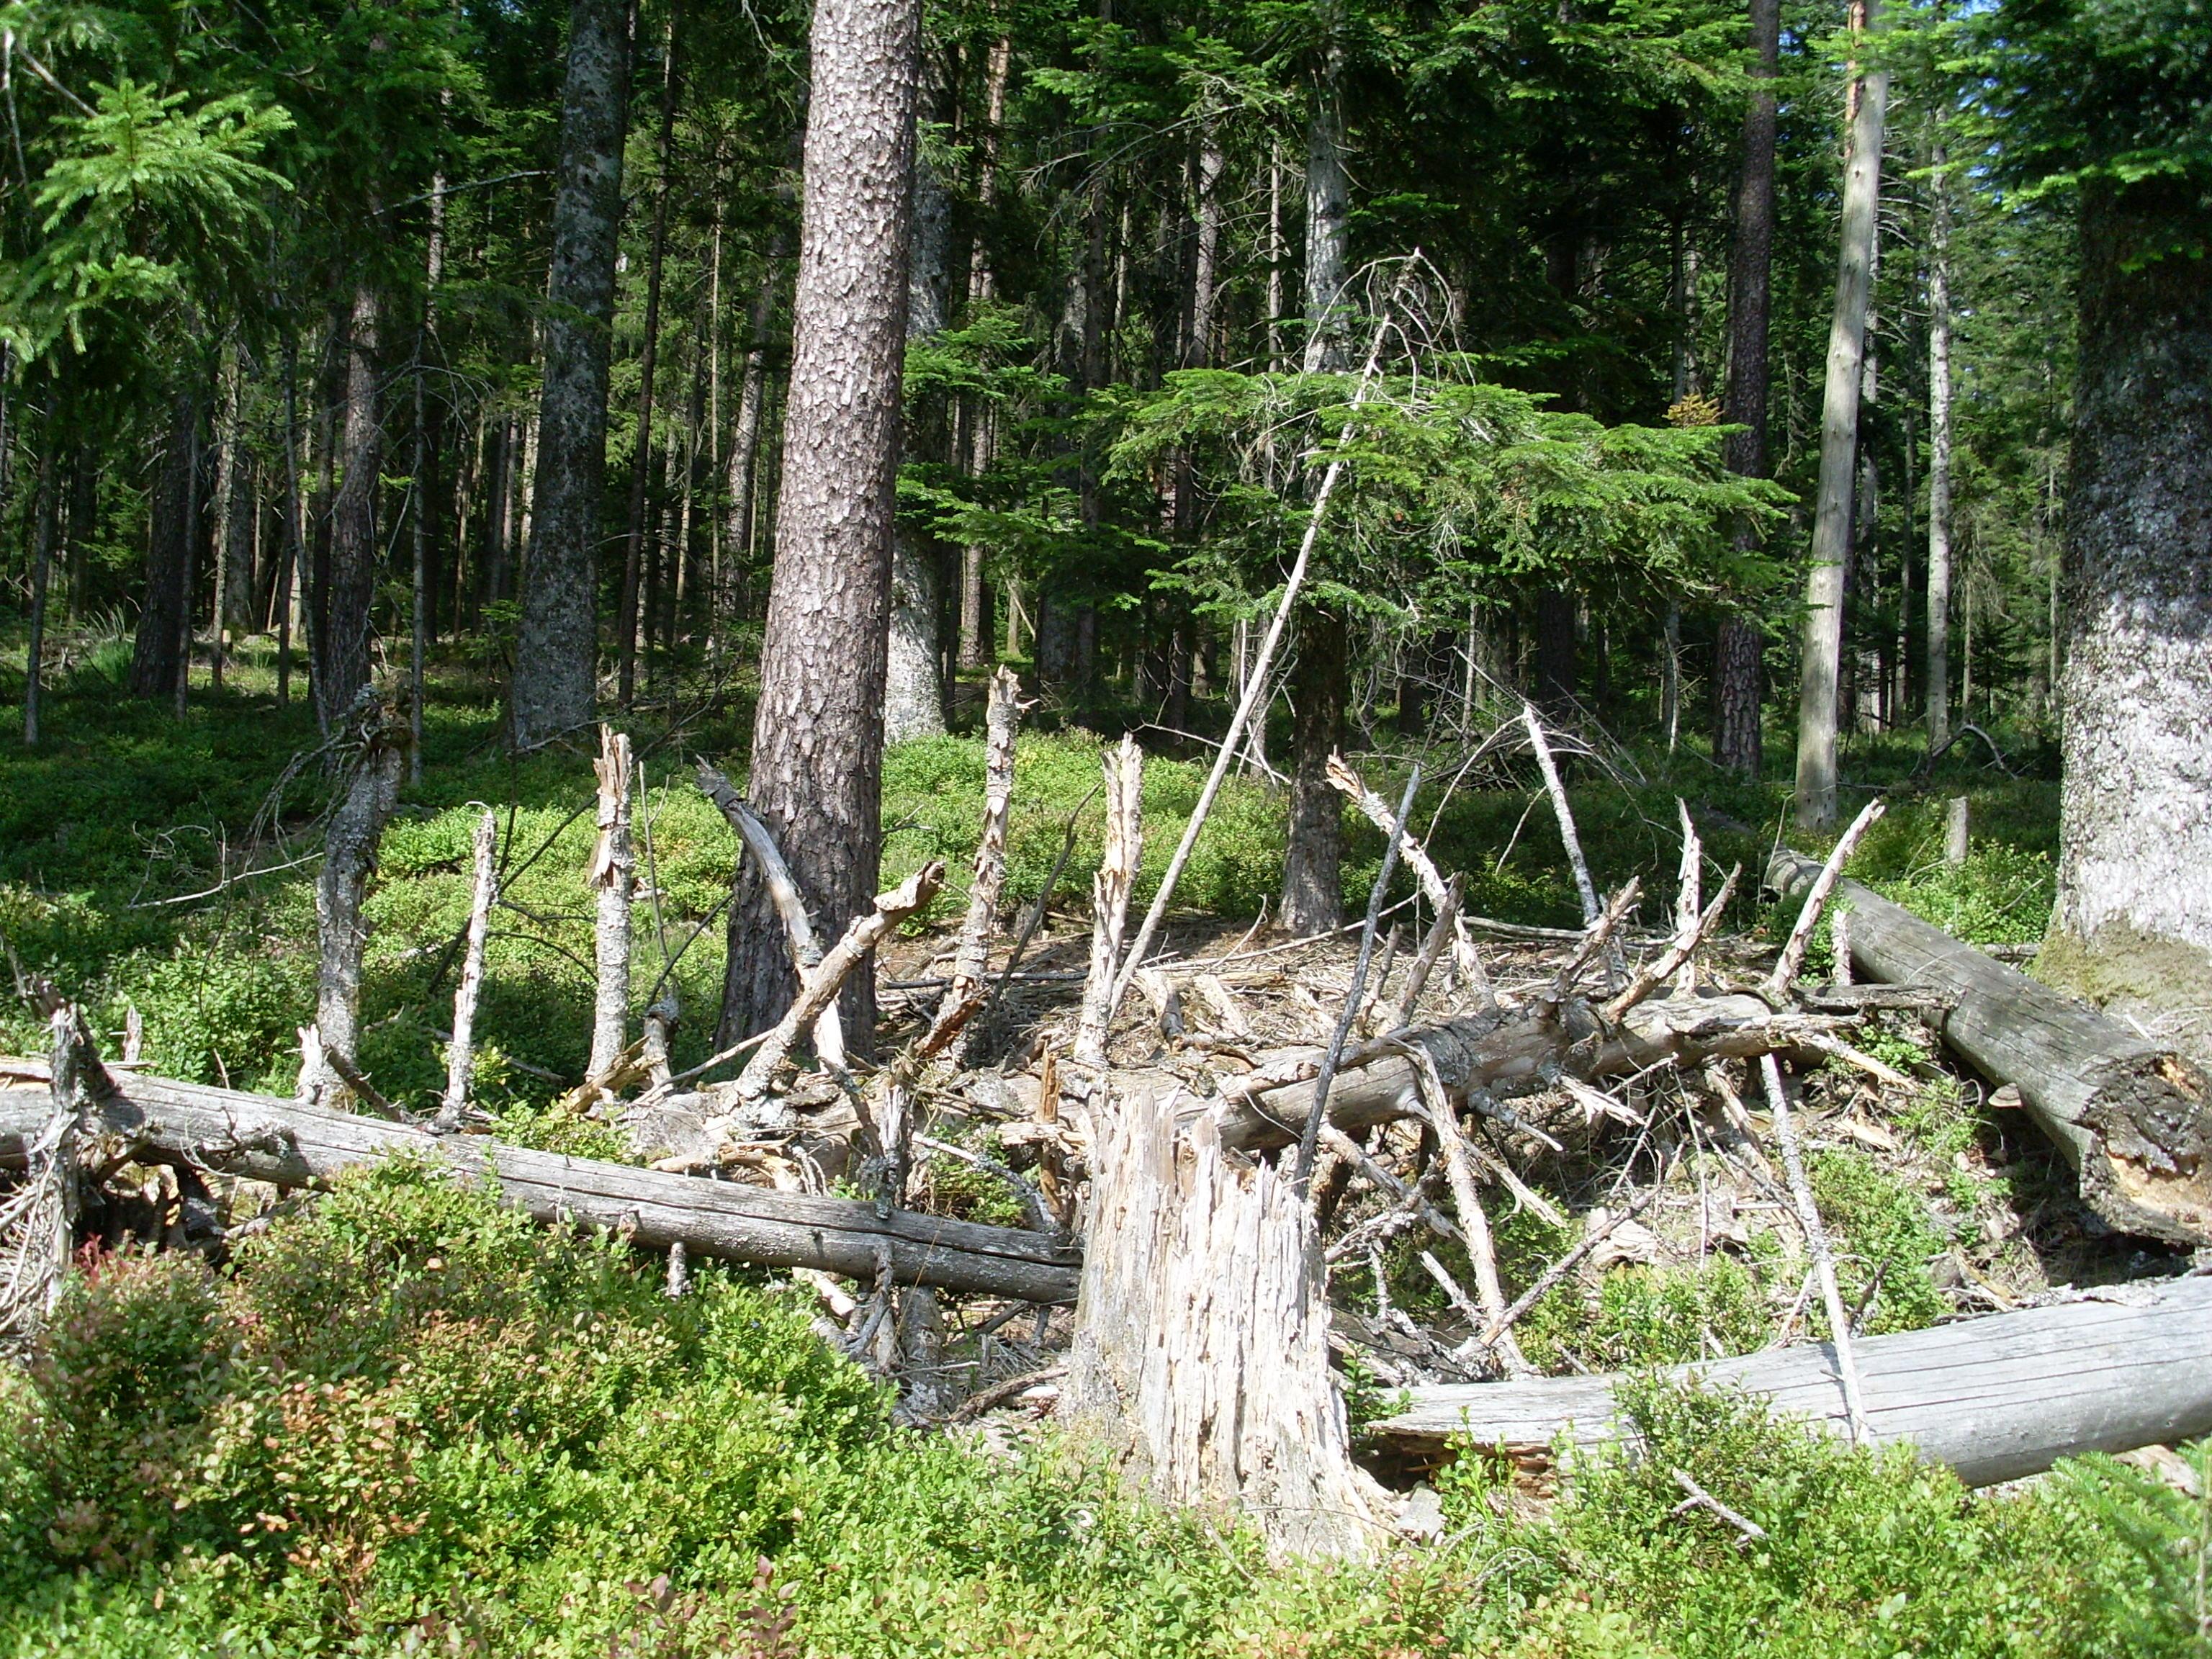 Totholz als Überbleibsel vom Orkan Lothar